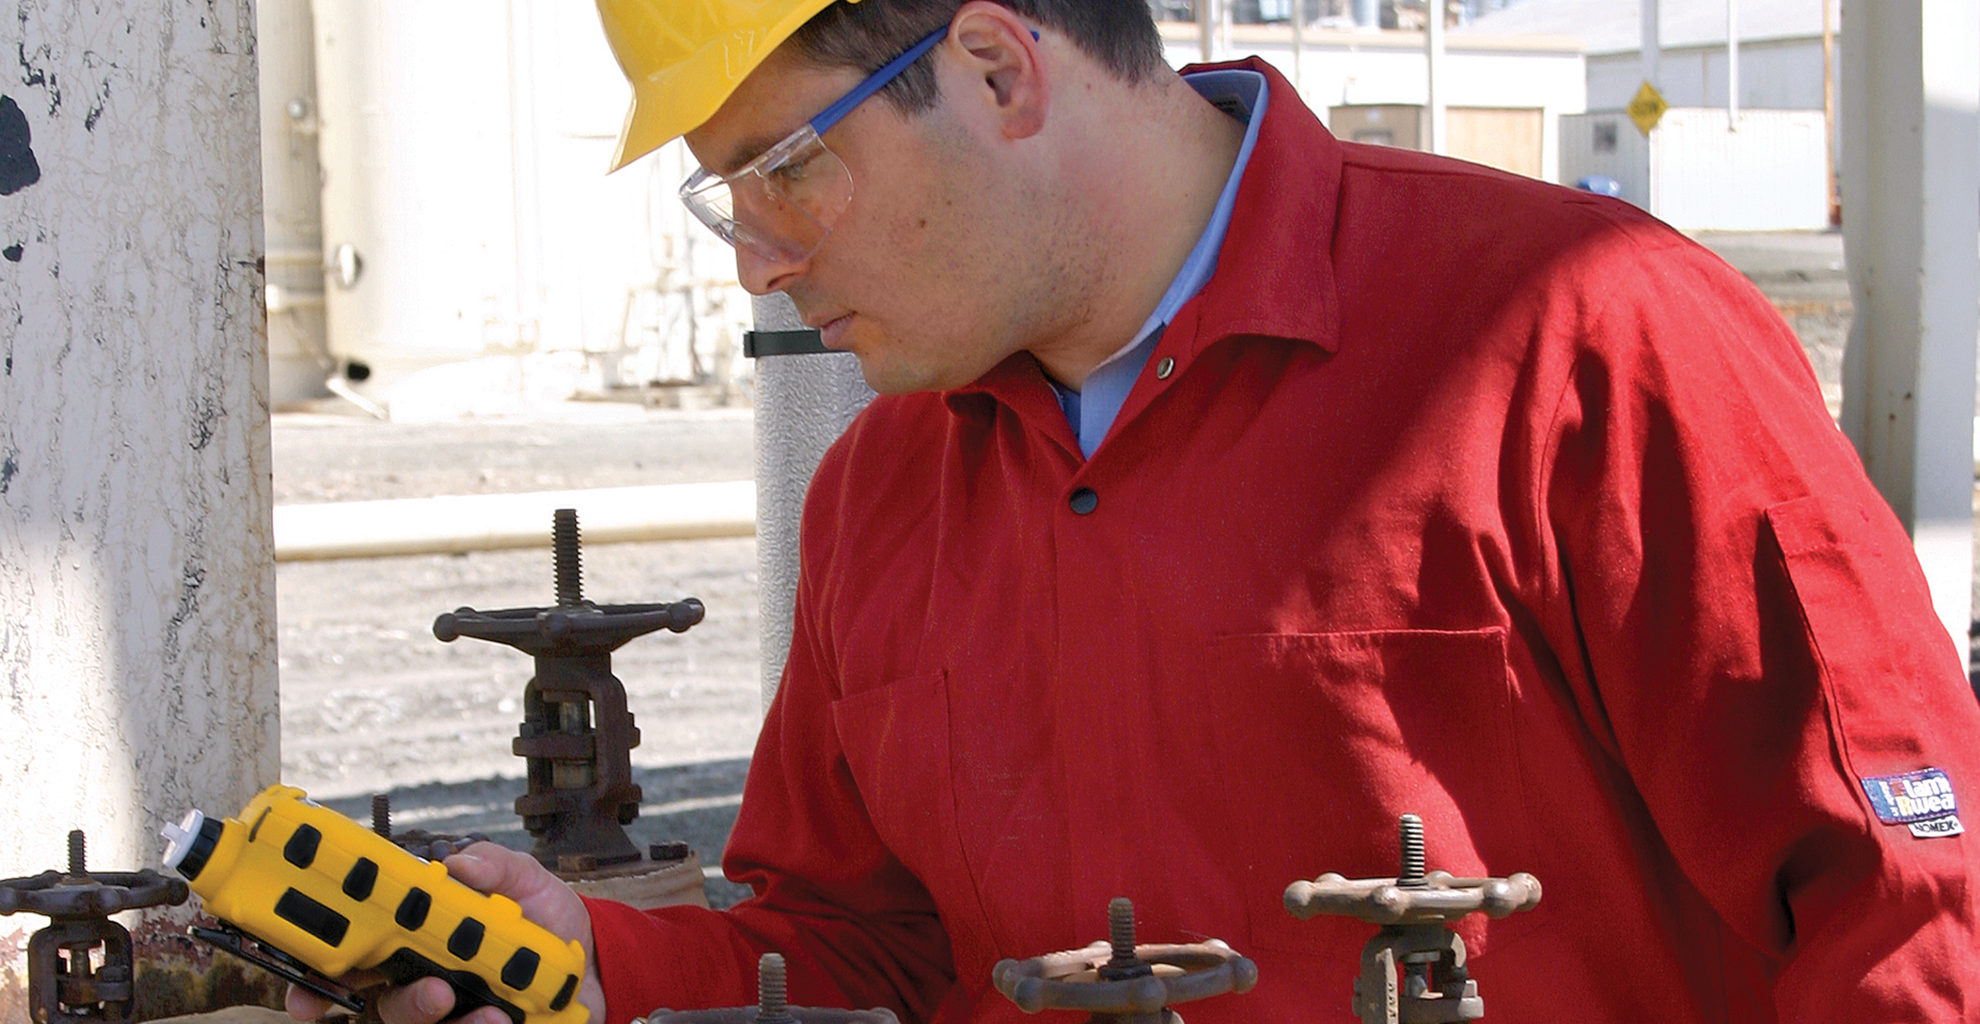 portable 7solutions - Vast opgestelde gas detectie   Draagbare gas detectie   Lekdetectie en Draadloze gas detectie